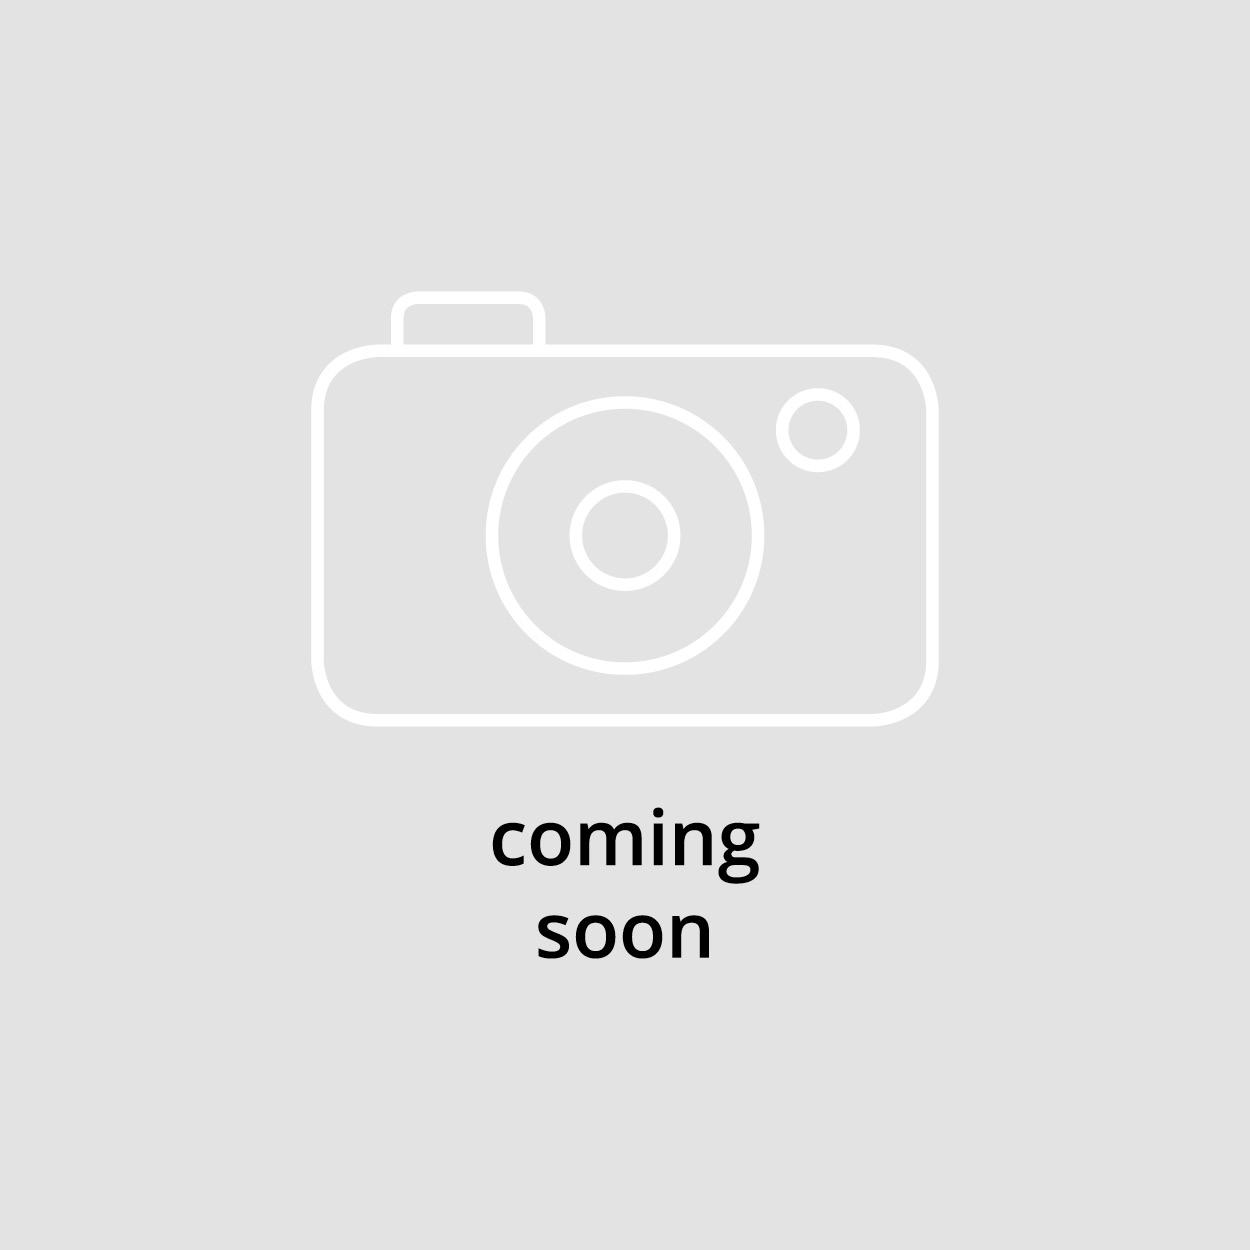 15.18.205 Molla per Giunto mandrino frontale Gildemeister AS20, GS20, GM20, GM20AC